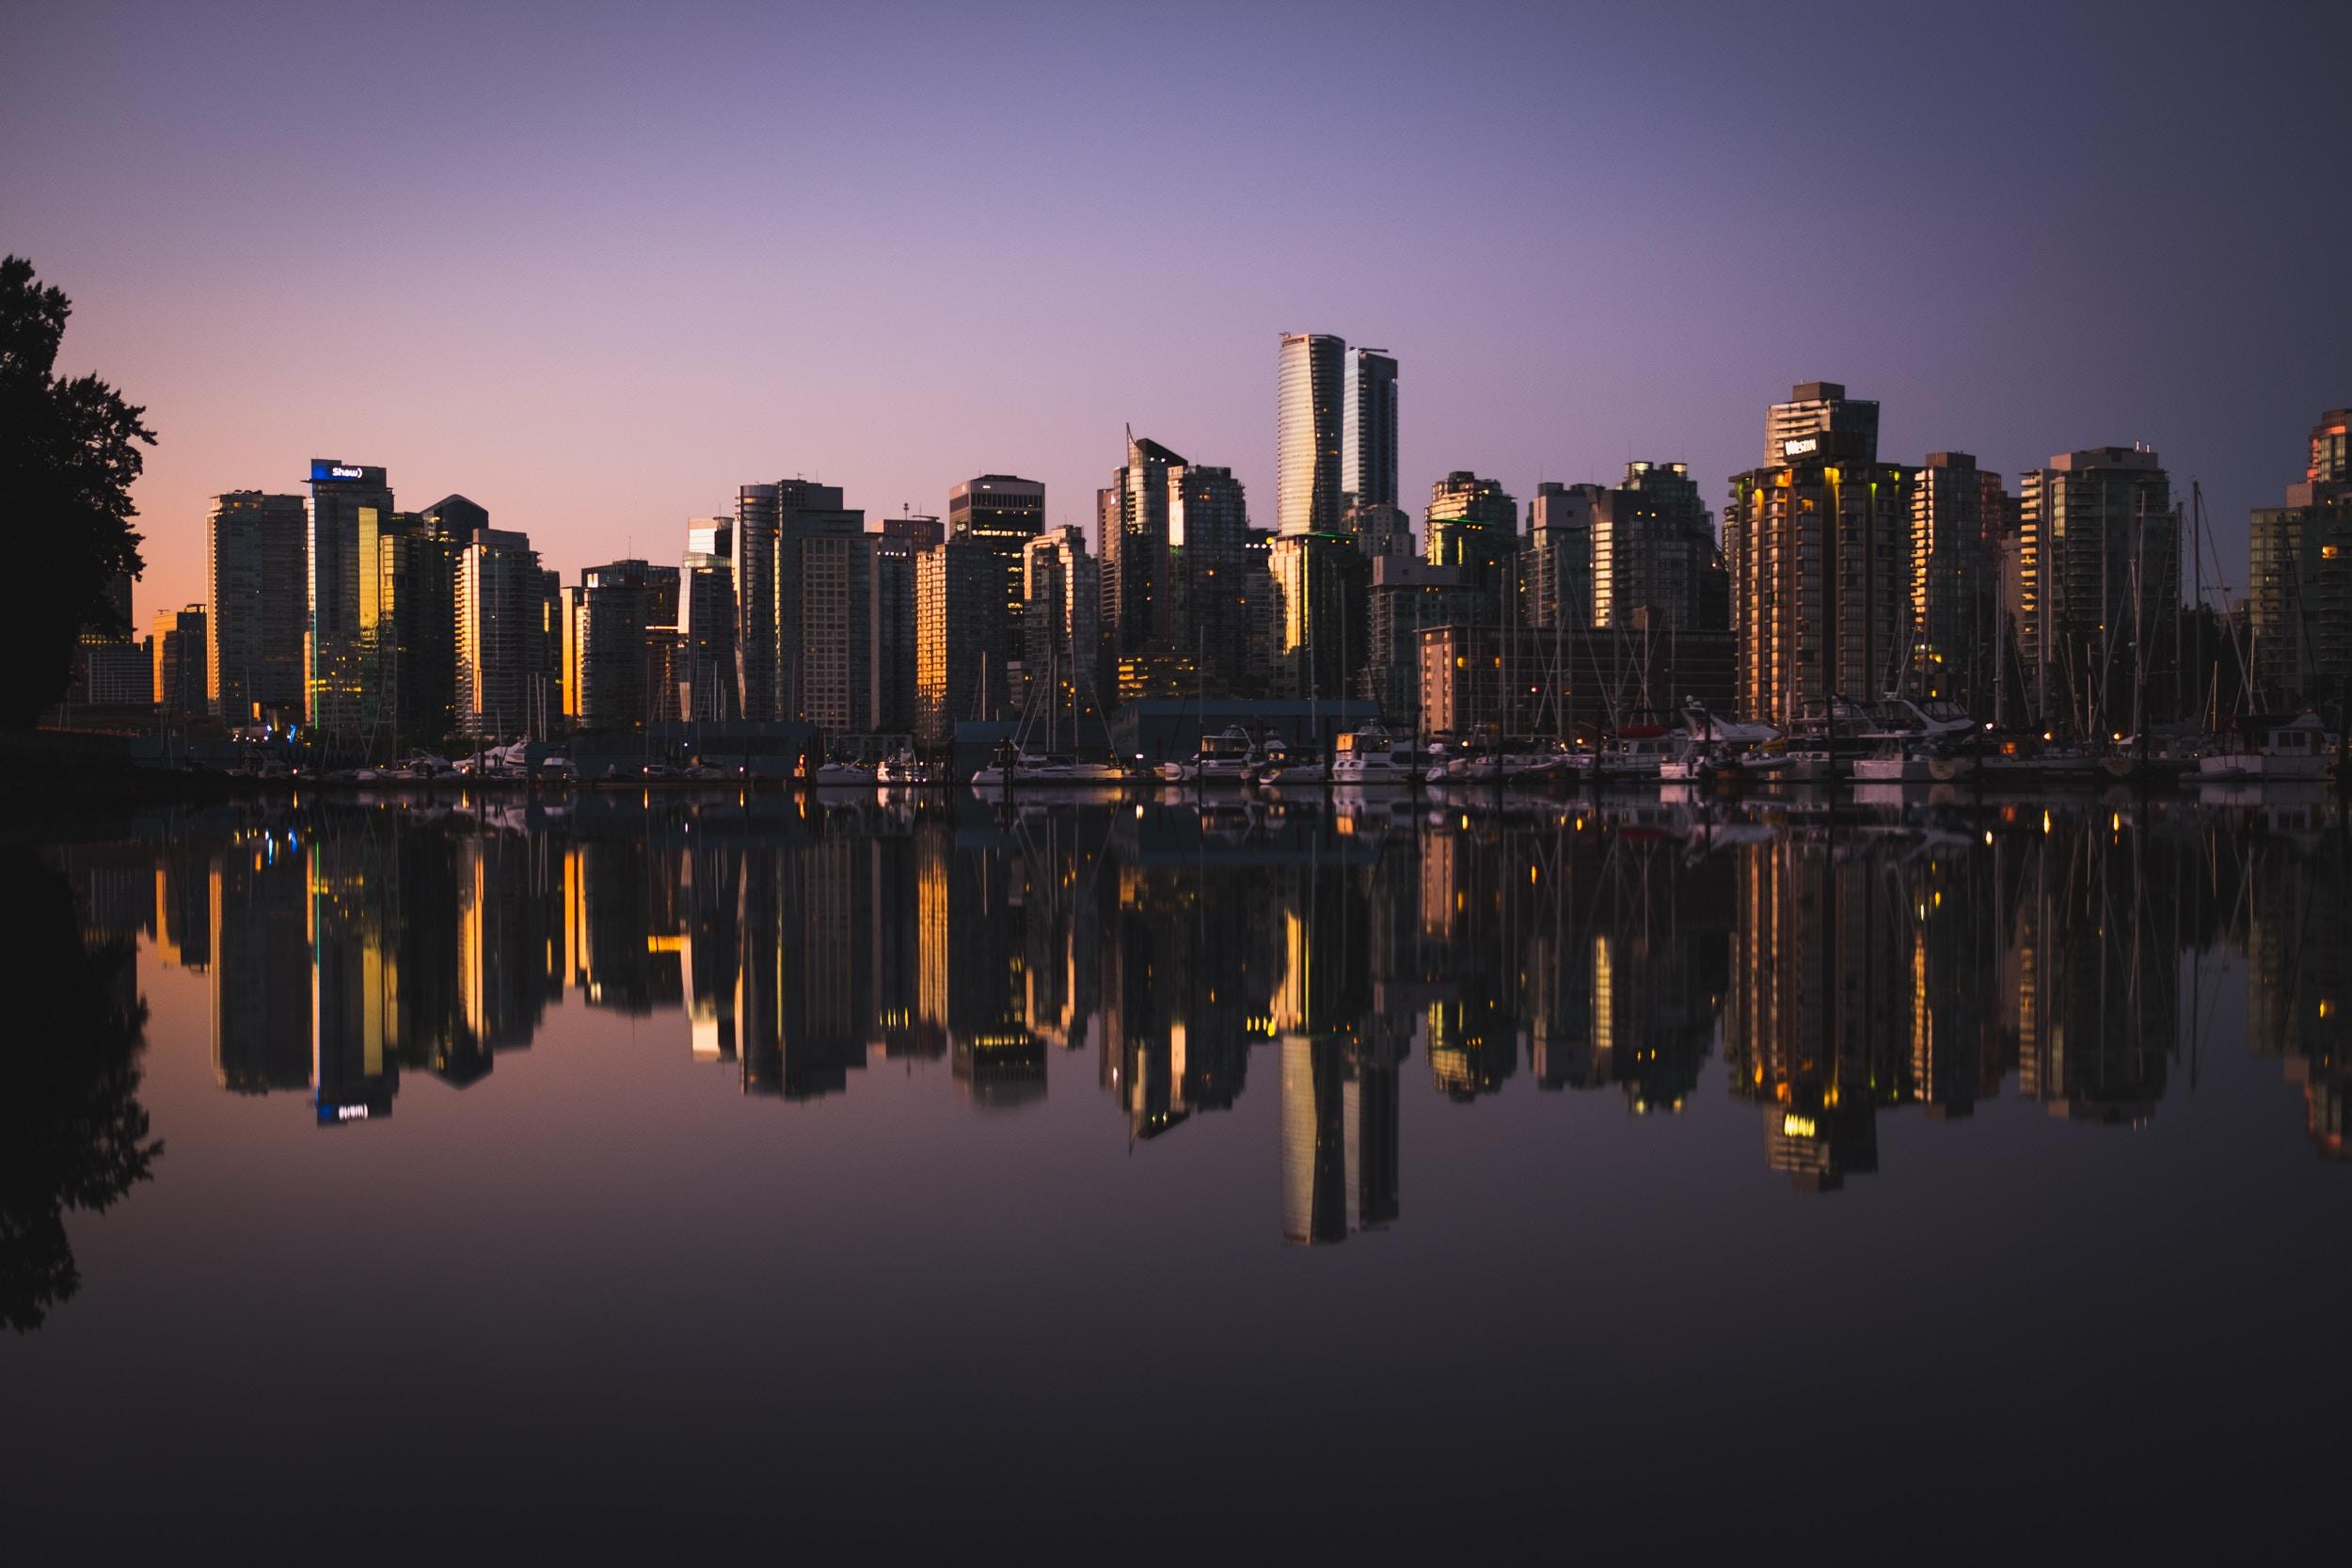 State of the City - PHoenix, Az